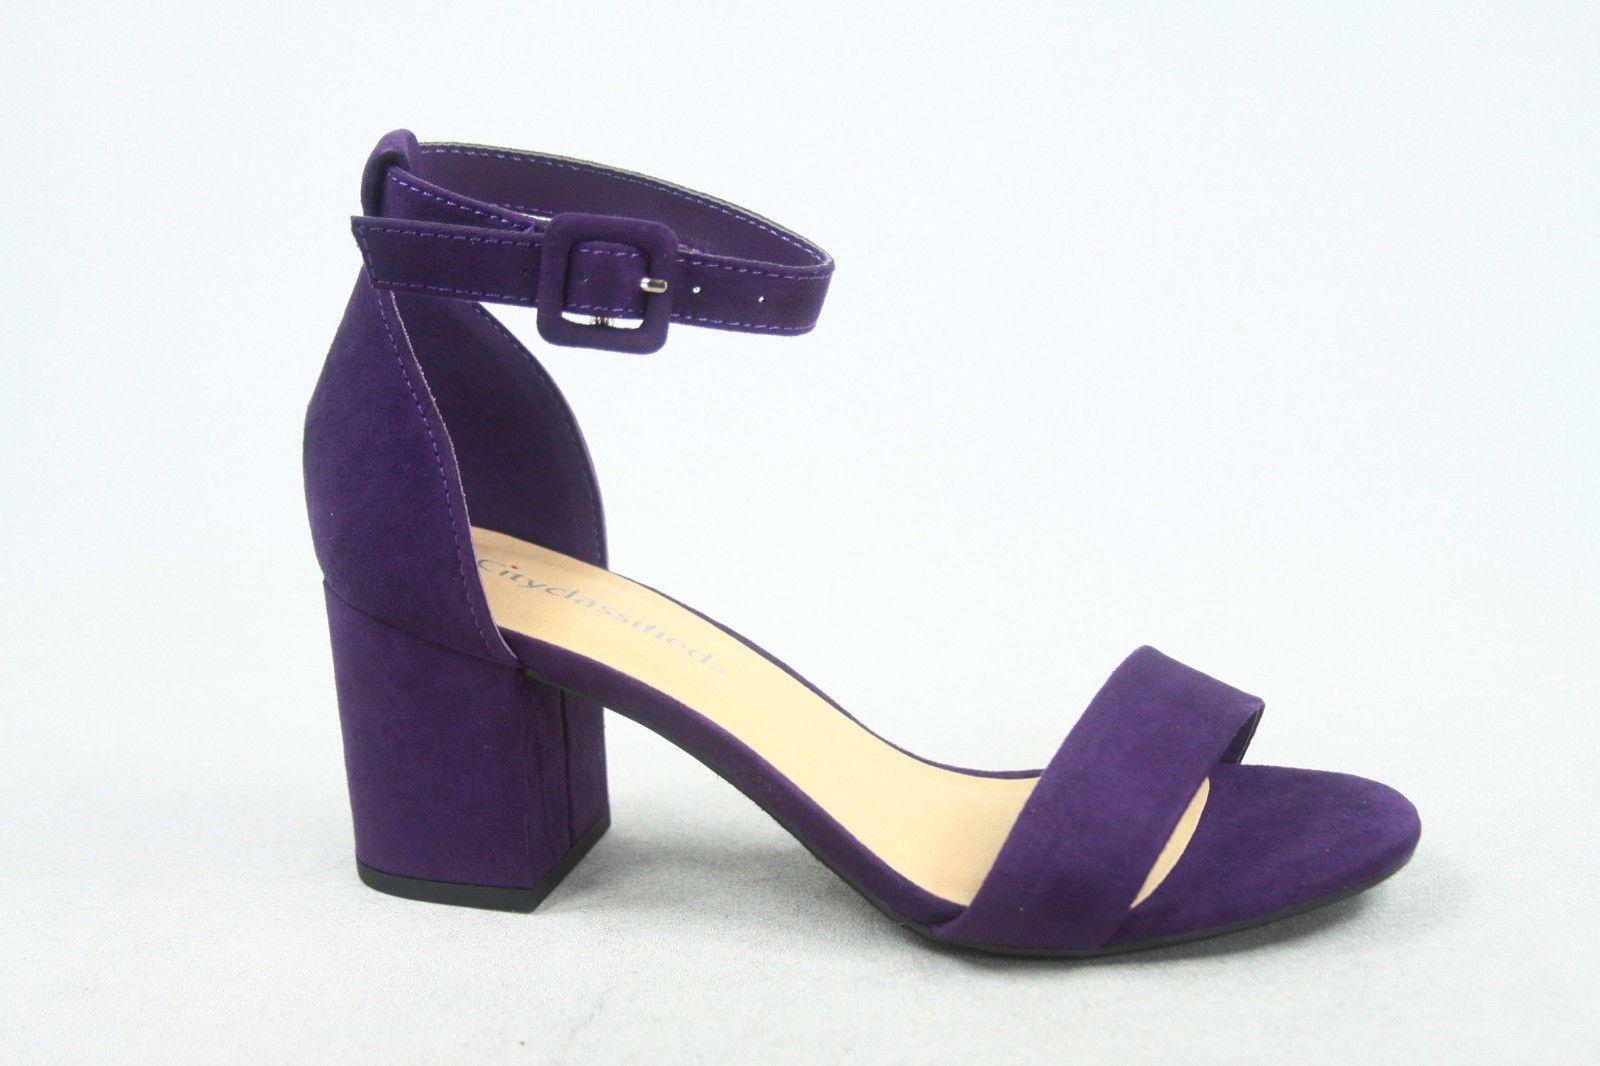 NEW Strap Dress Shoes 5